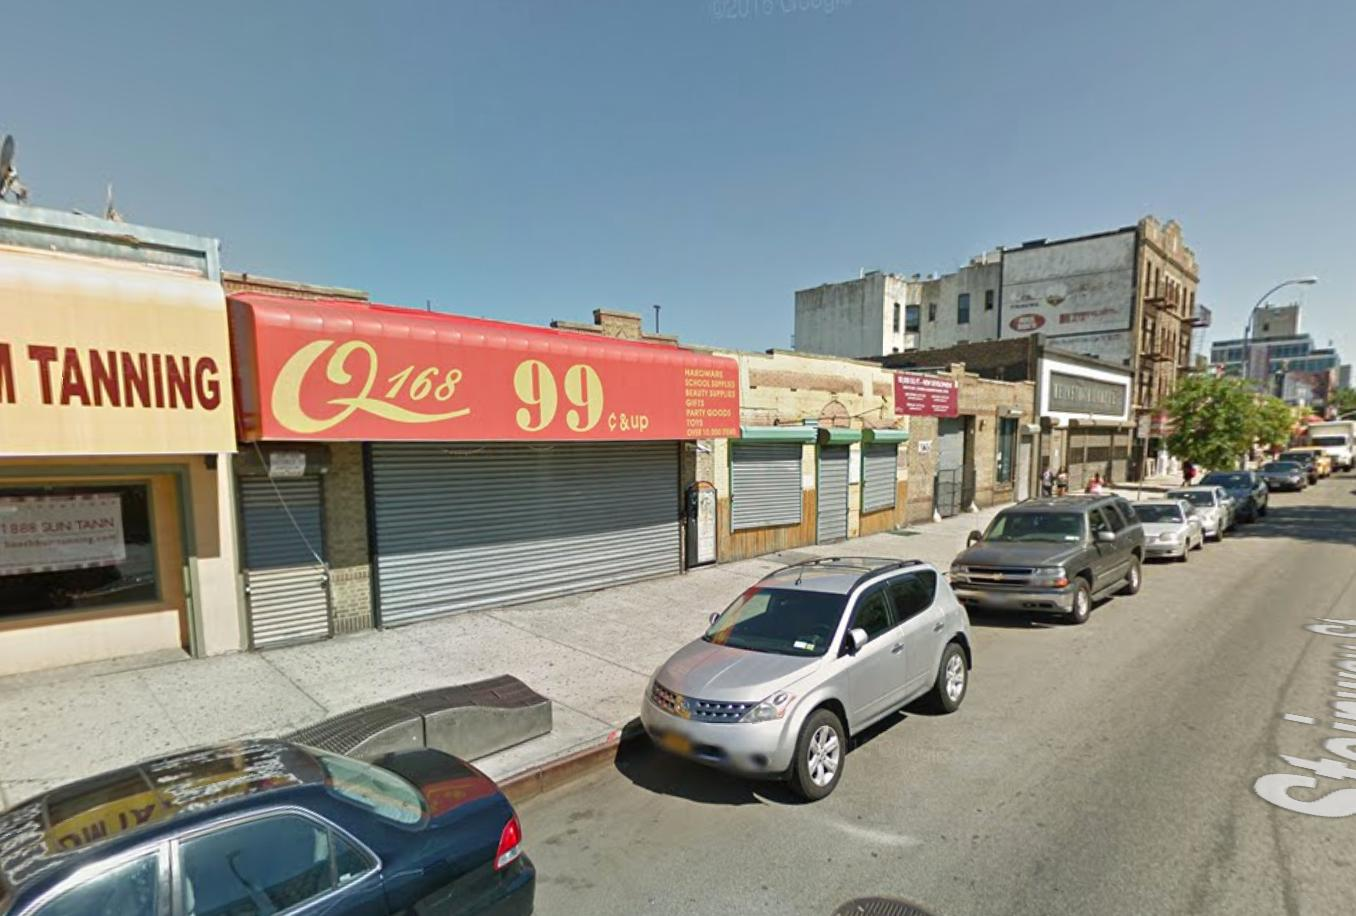 34-30 Steinway Street